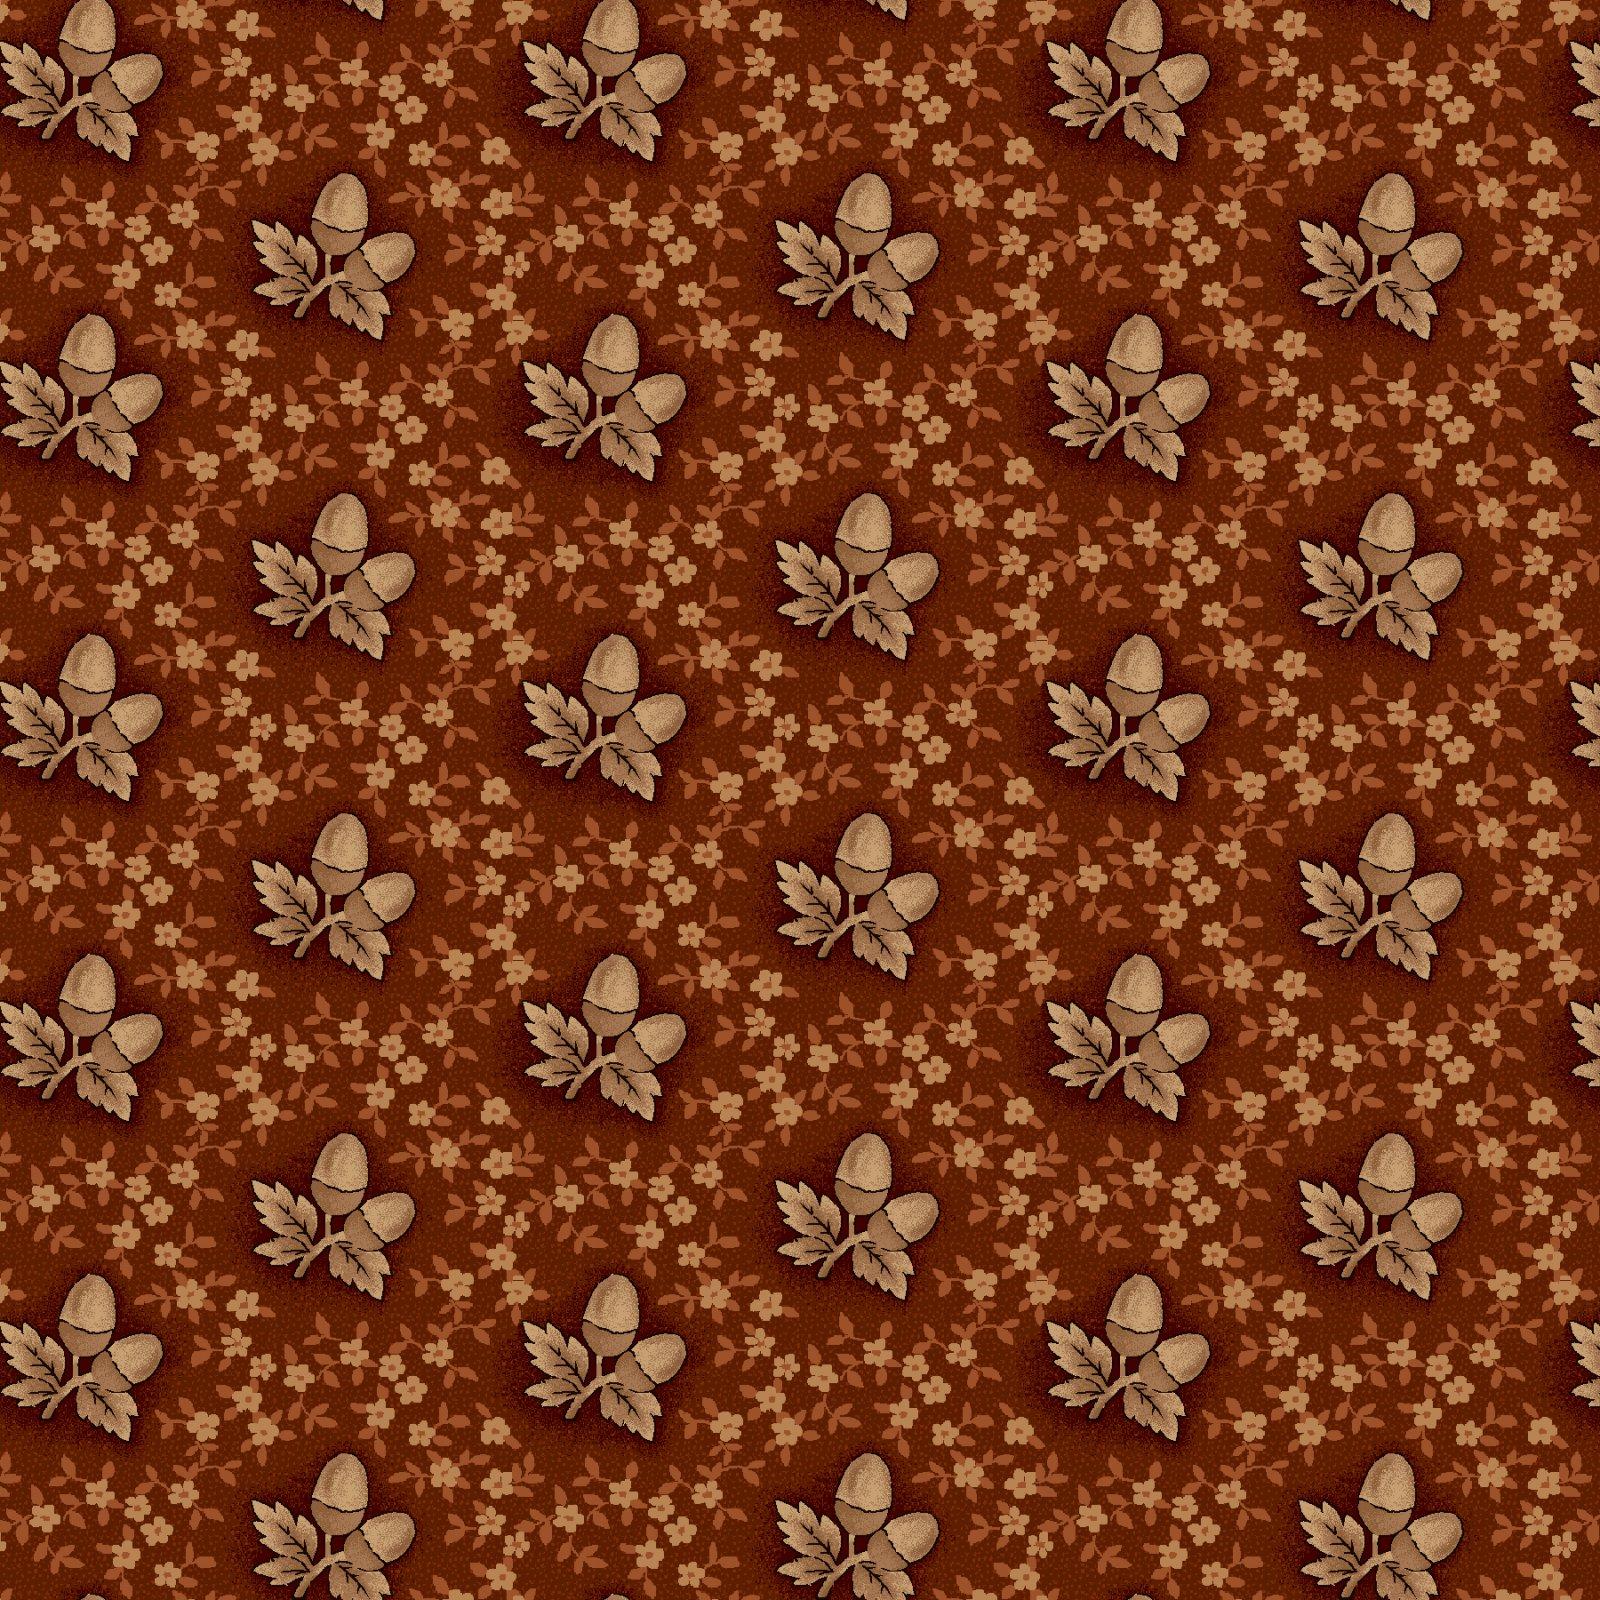 Buttermilk Autumn * 17 Piece Fat 1/4 Bundle